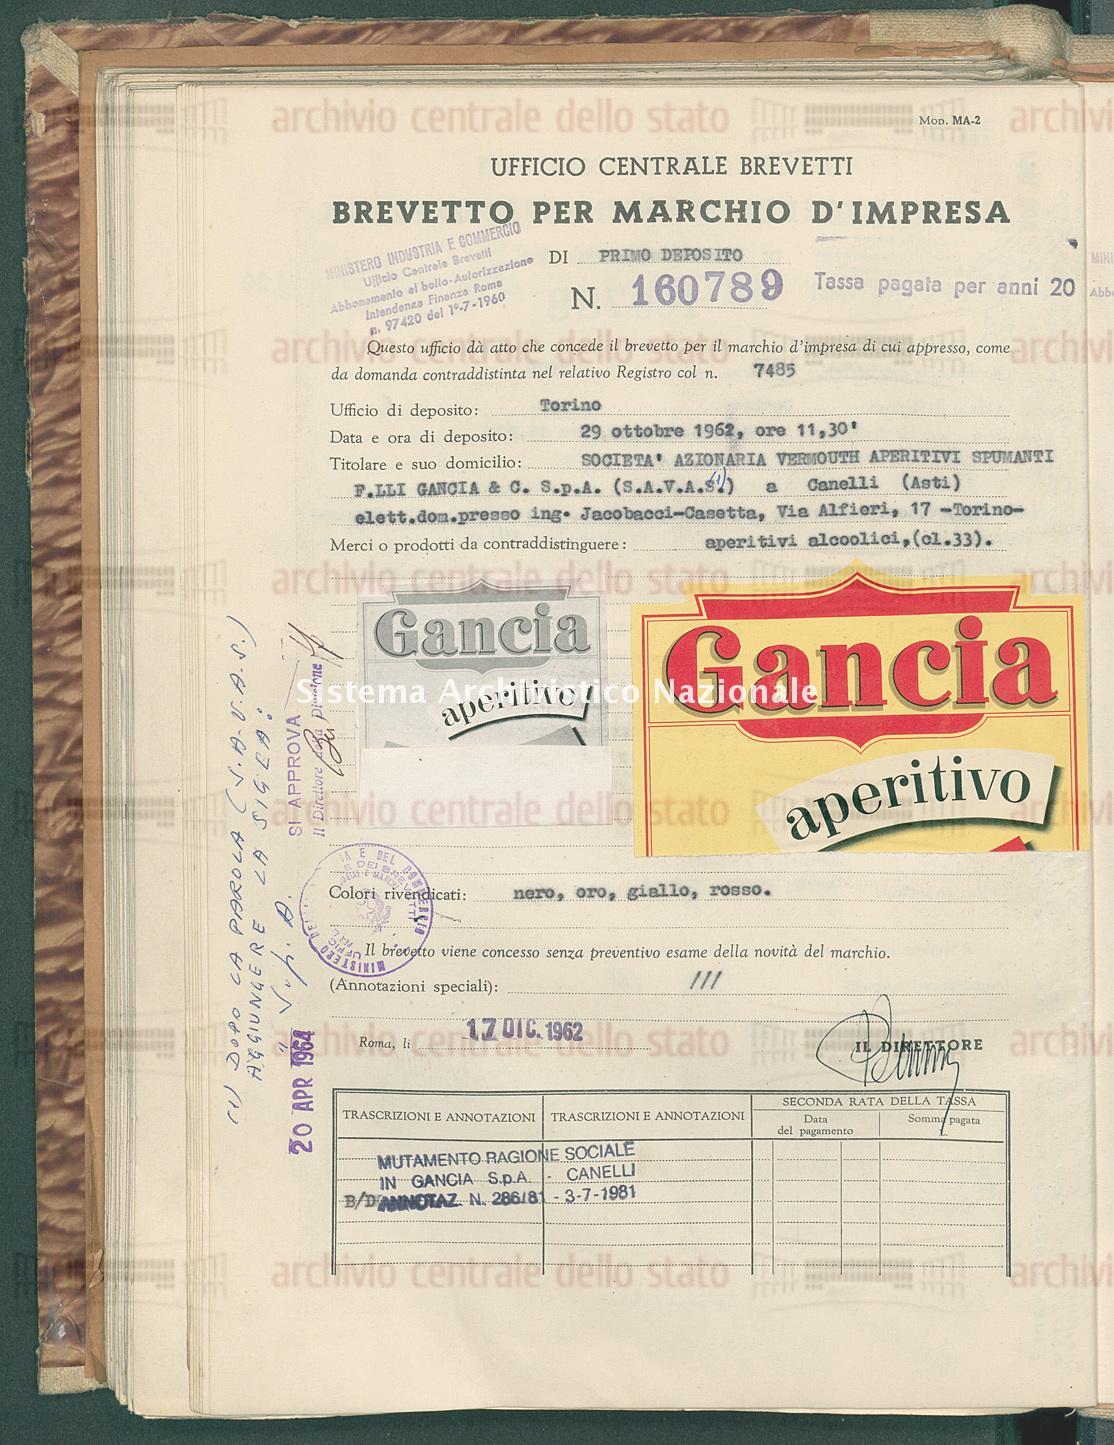 Aperitivi alcoolici Societa' Azionaria Vermouth Aperitivi Spumanti F.Lli Gancia & C. S.P.A. (S.A.V.A.S.) (17/12/1962)